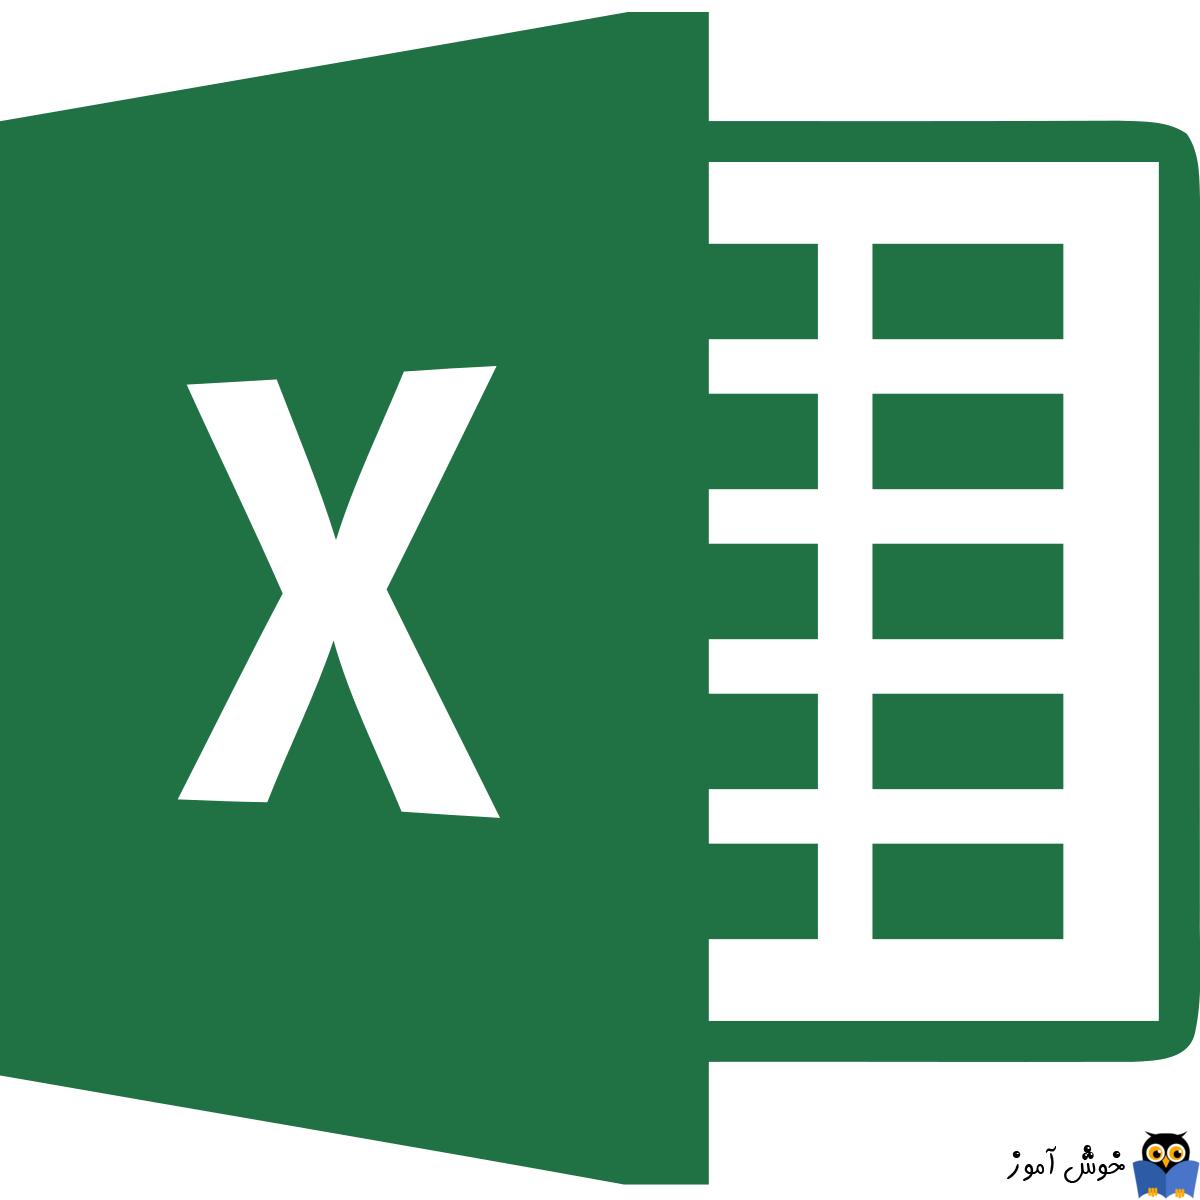 رفع ارور Microsoft Excel is trying to recover your information